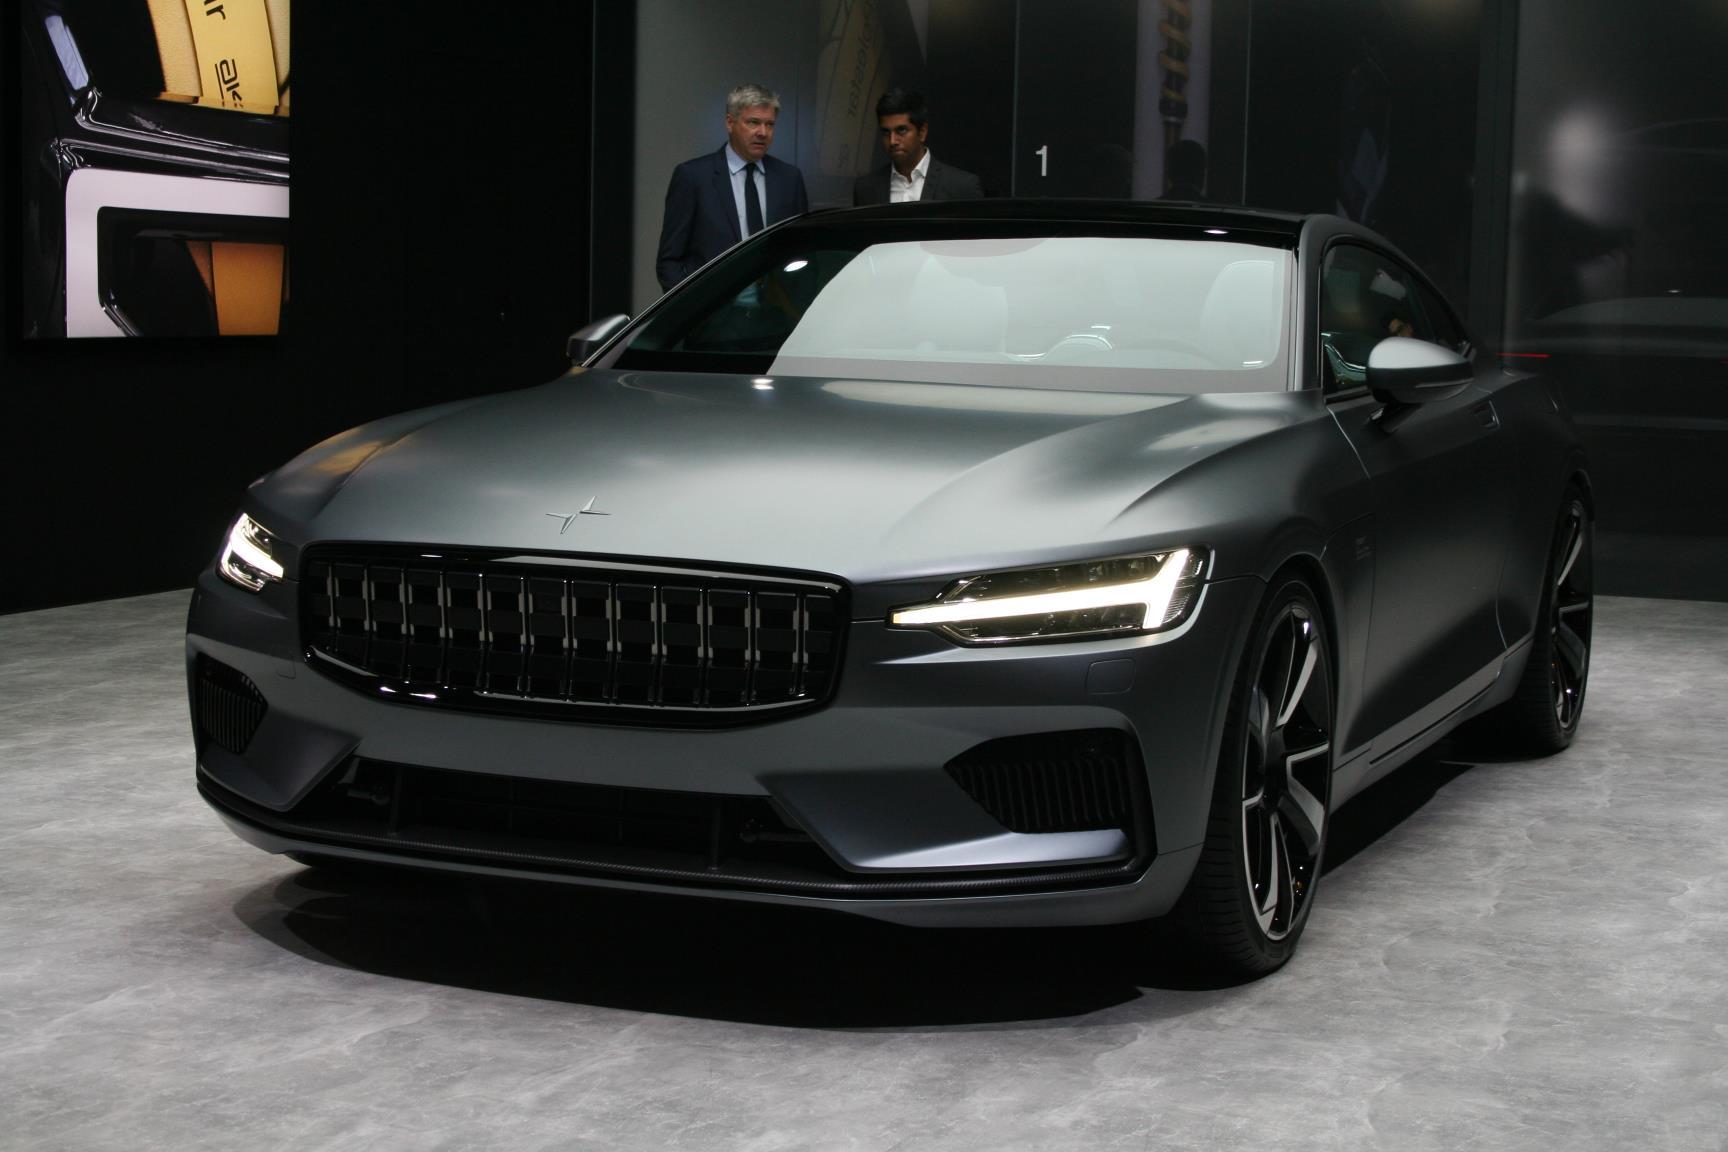 Geneva Motor Show 2018 Mega Gallery Part 1 (146)